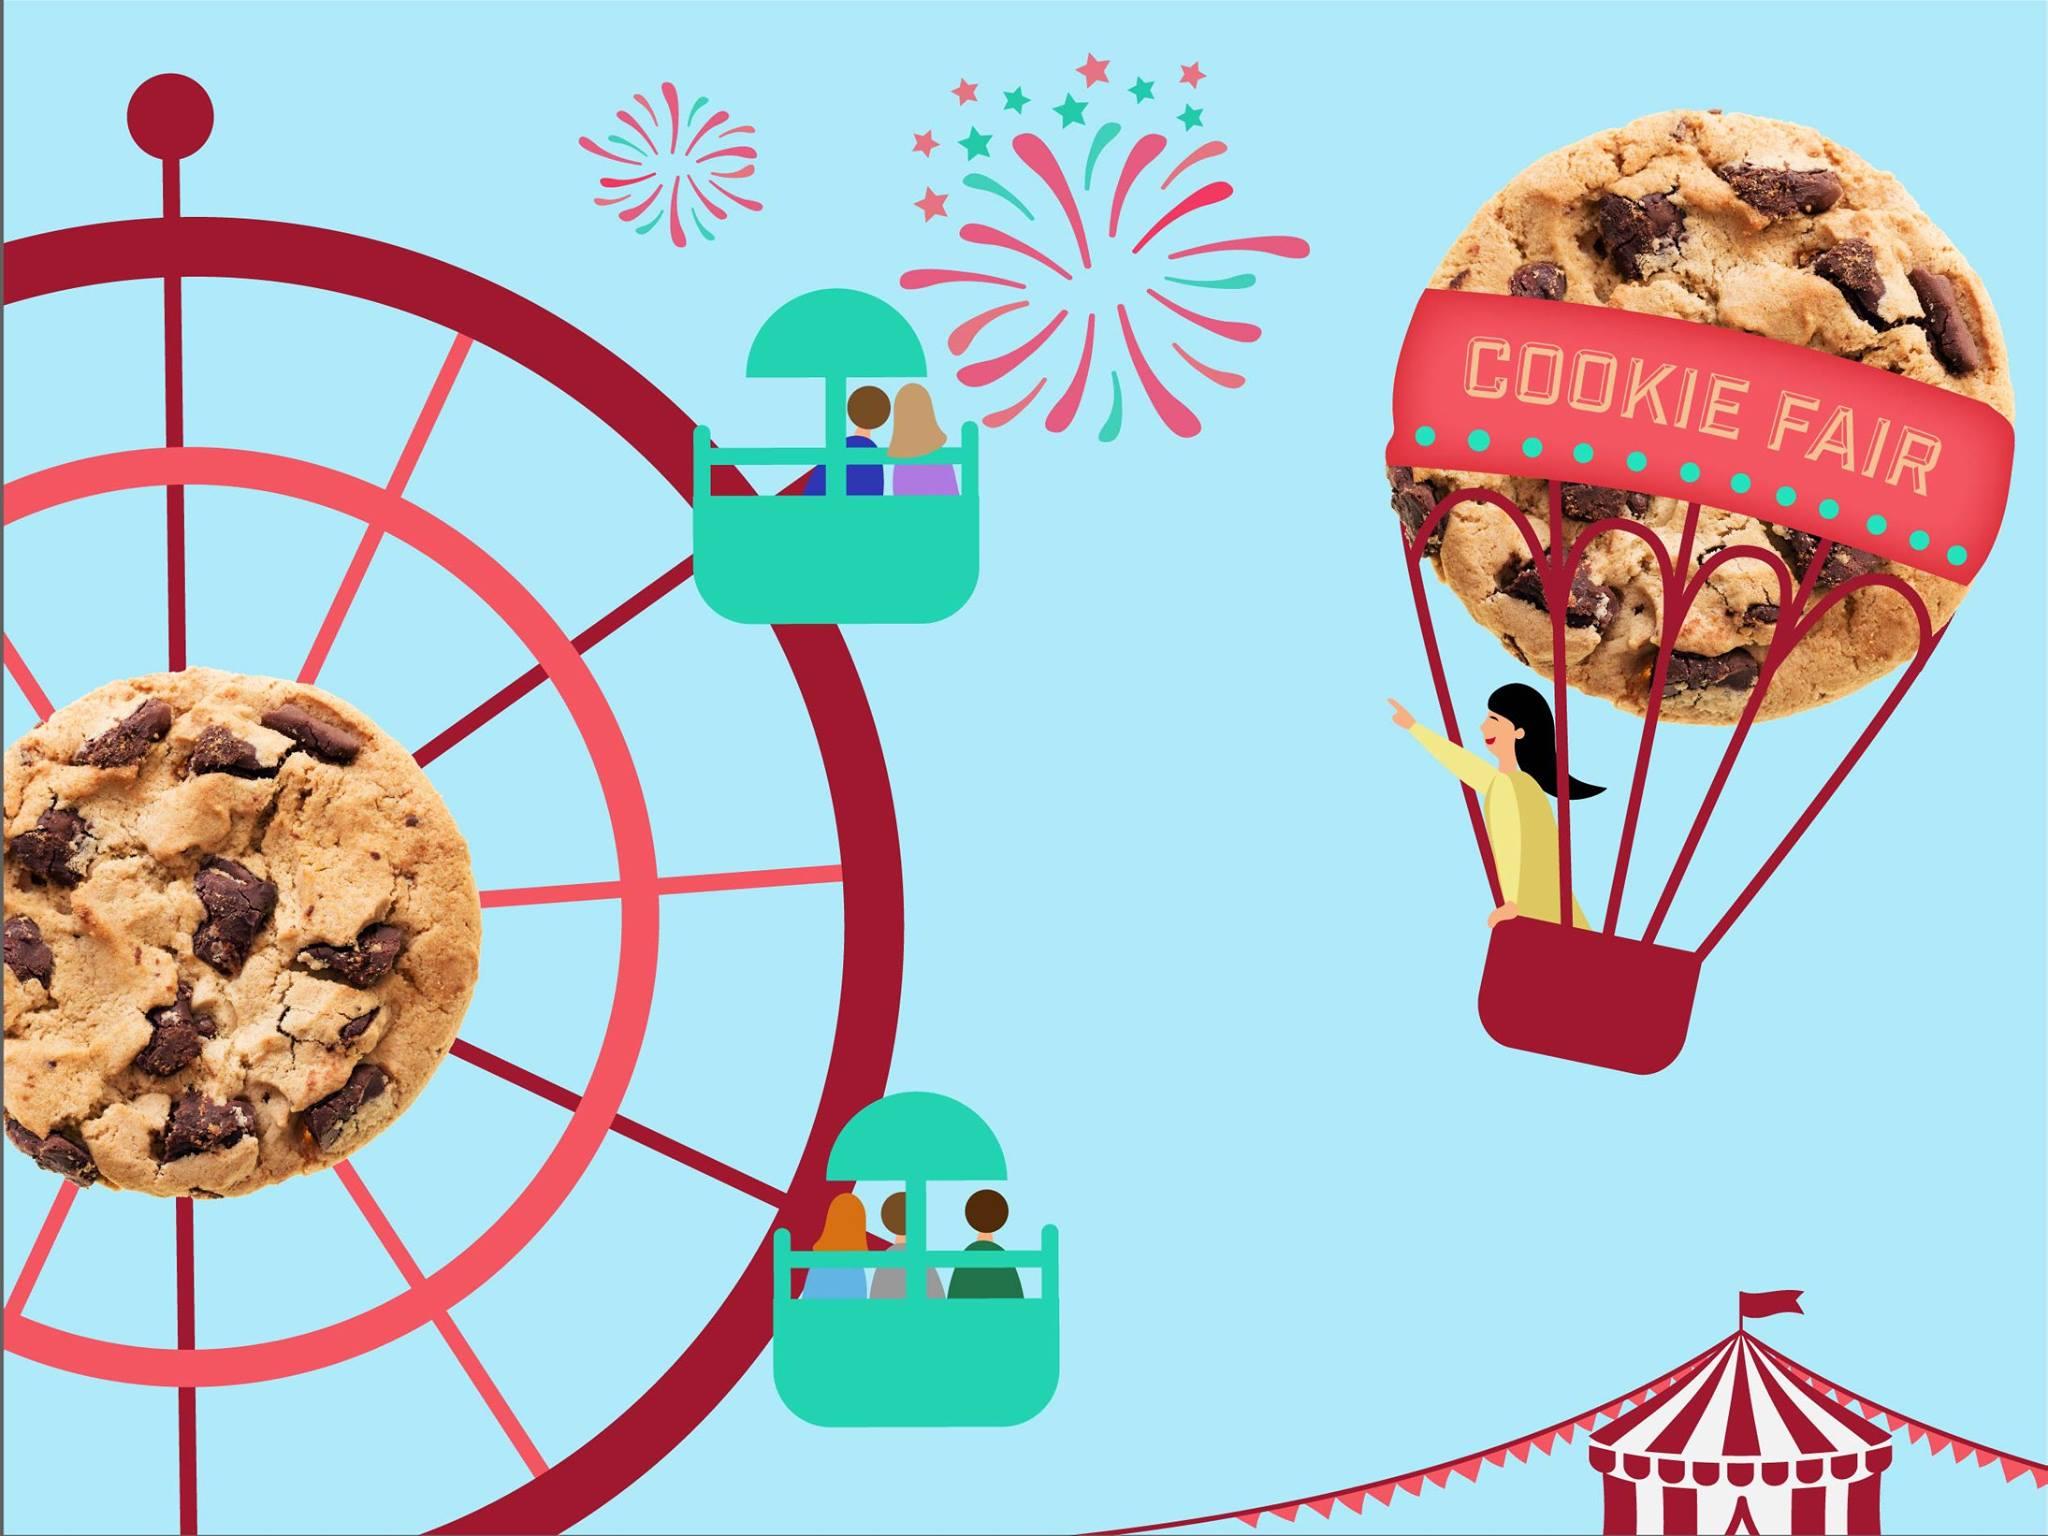 This is the original draft for Milkybar's Cookies & Cream bar |Adobe Photoshop & Illustrator